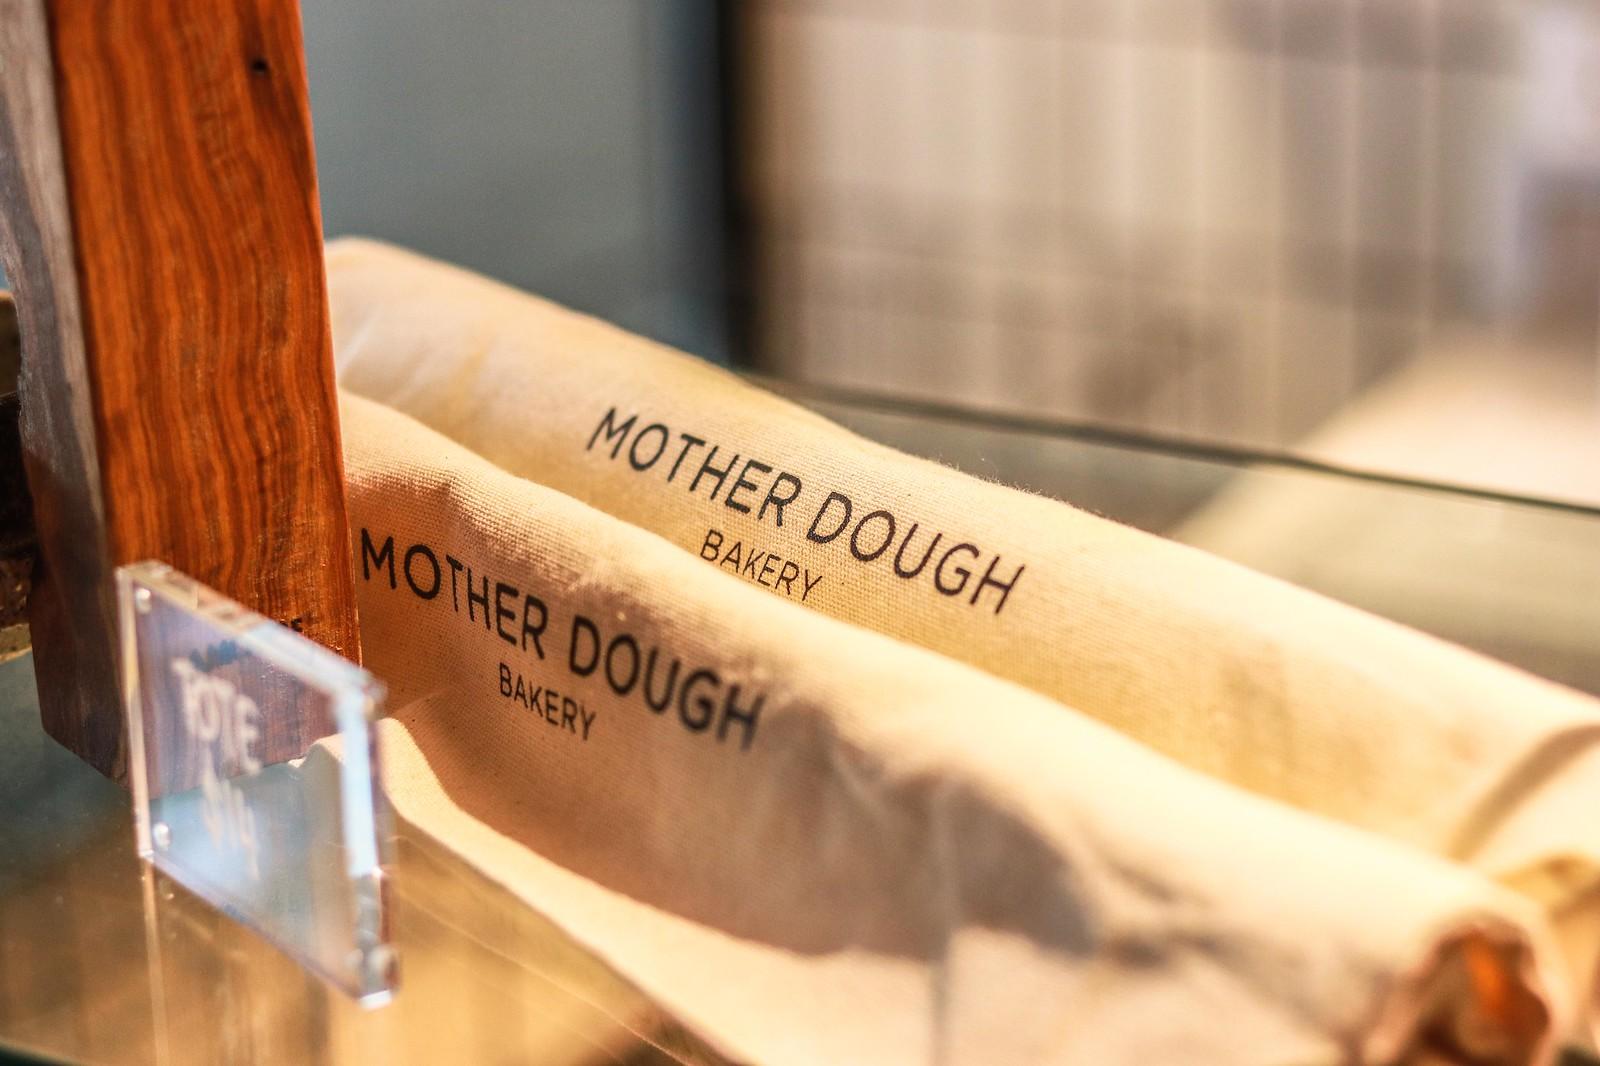 Mother dough-10